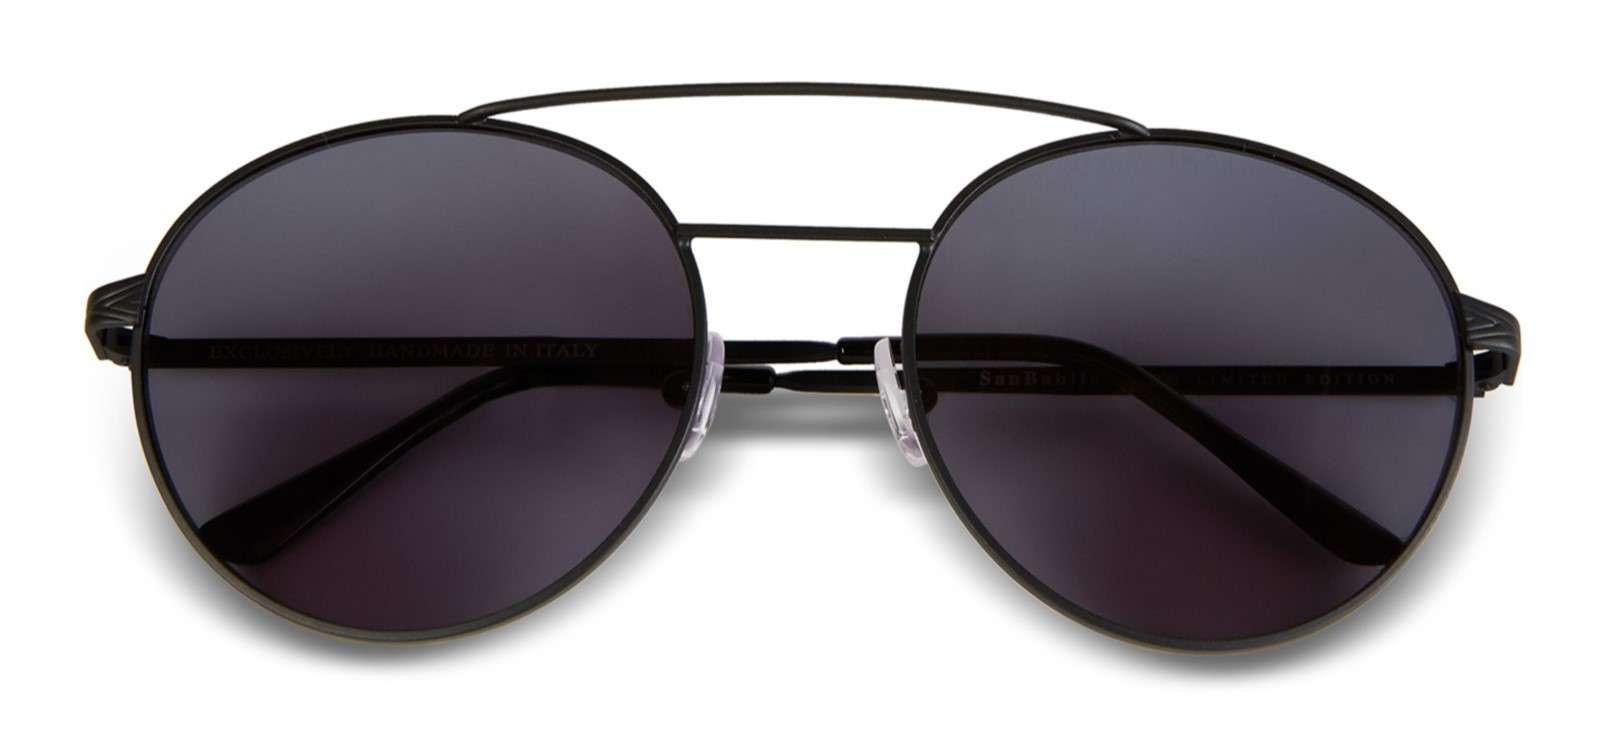 SanBabila sunglasses by Boggi Milano - blue - frontal